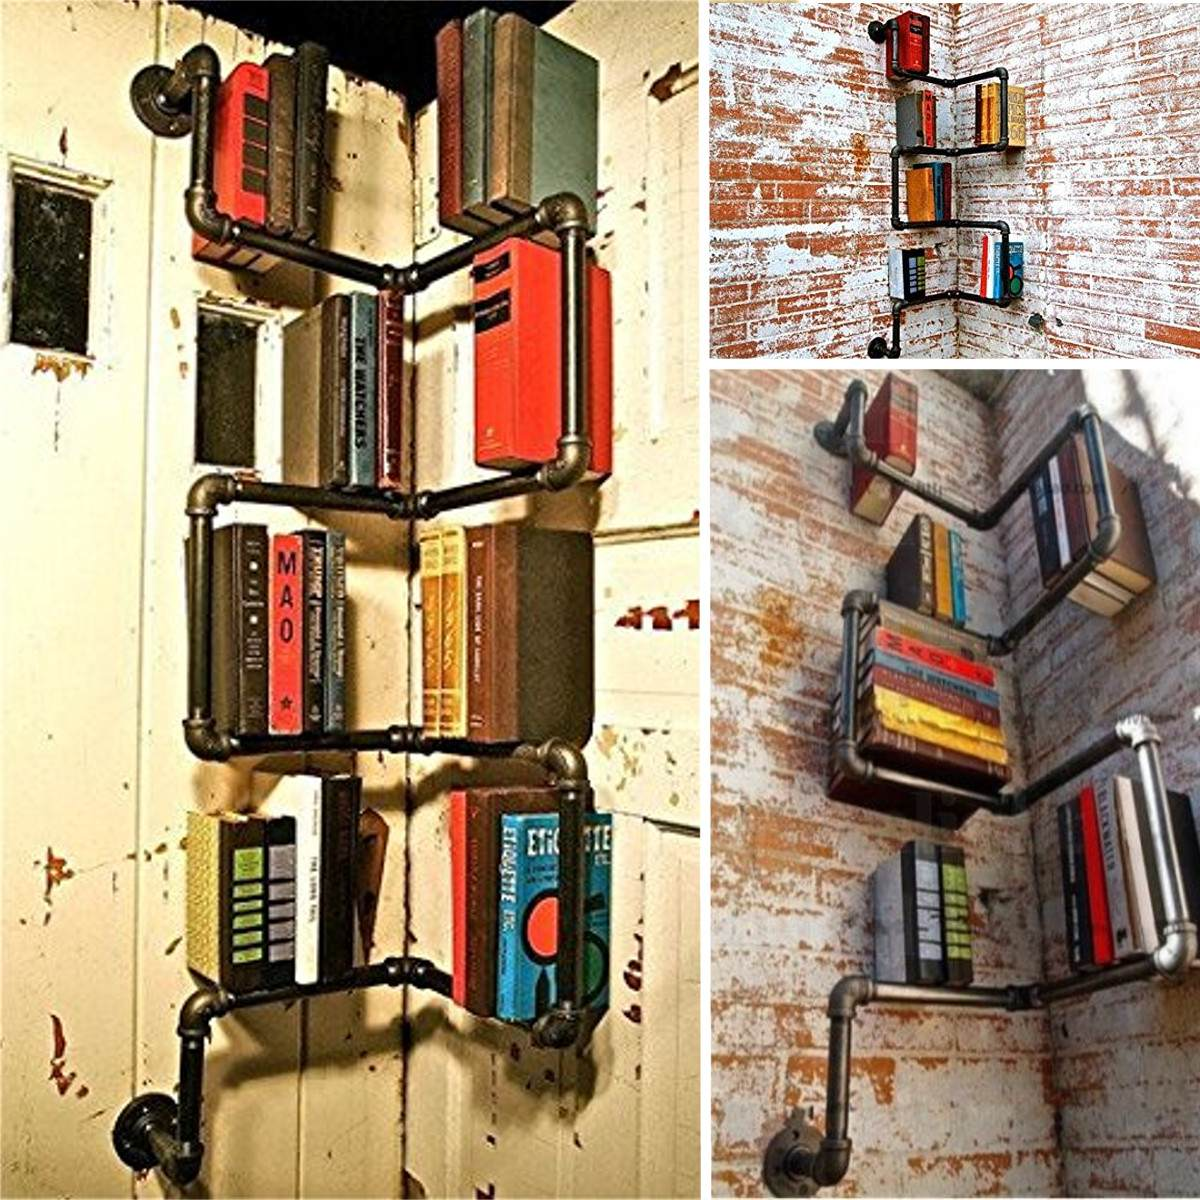 Industrial Urban Style Pipe Shelf Storage Shelving Book Wall Mount DIY Holder Black Iron Decoration